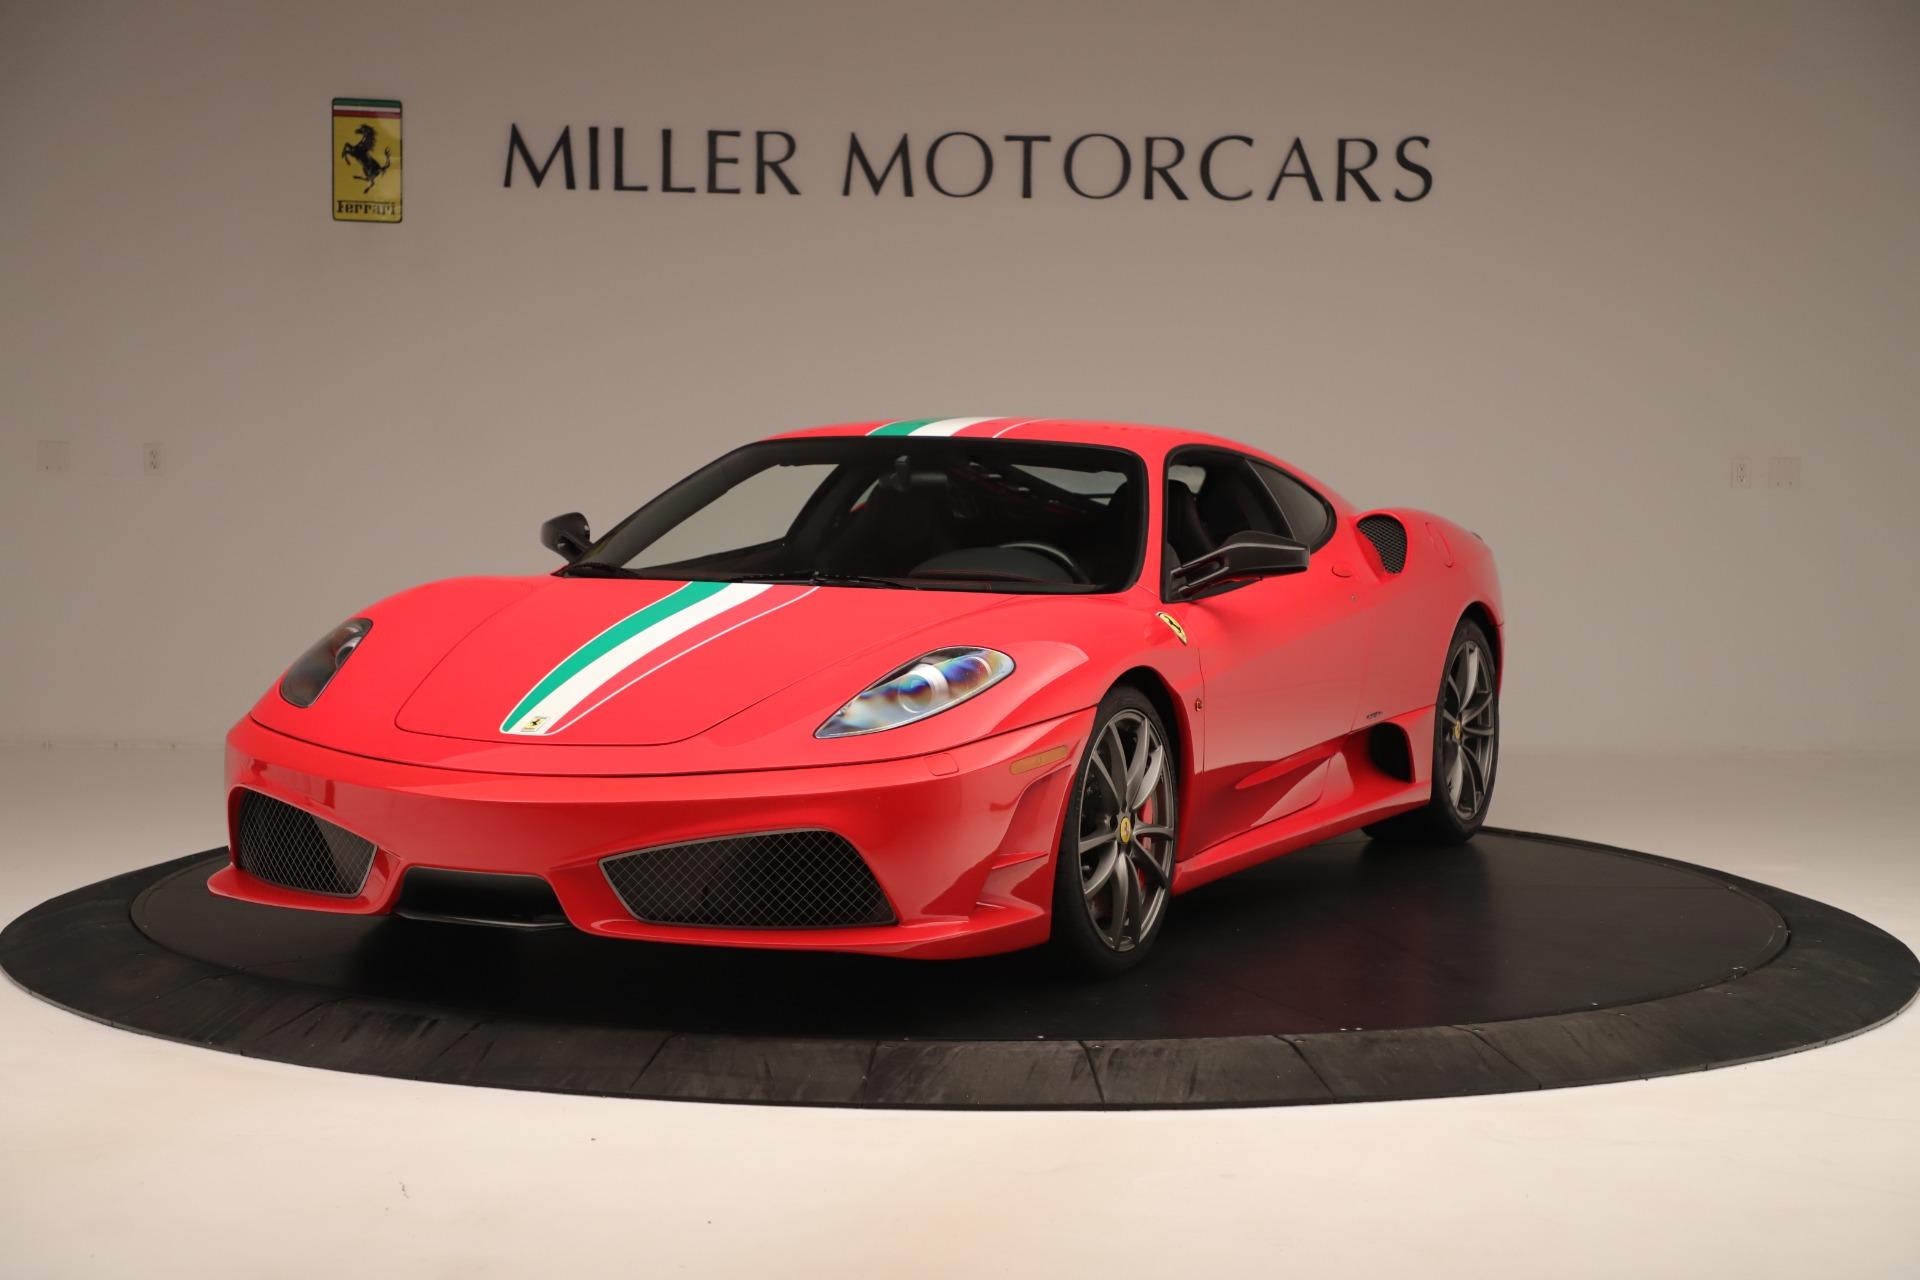 Used 2008 Ferrari F430 Scuderia for sale $229,900 at McLaren Greenwich in Greenwich CT 06830 1